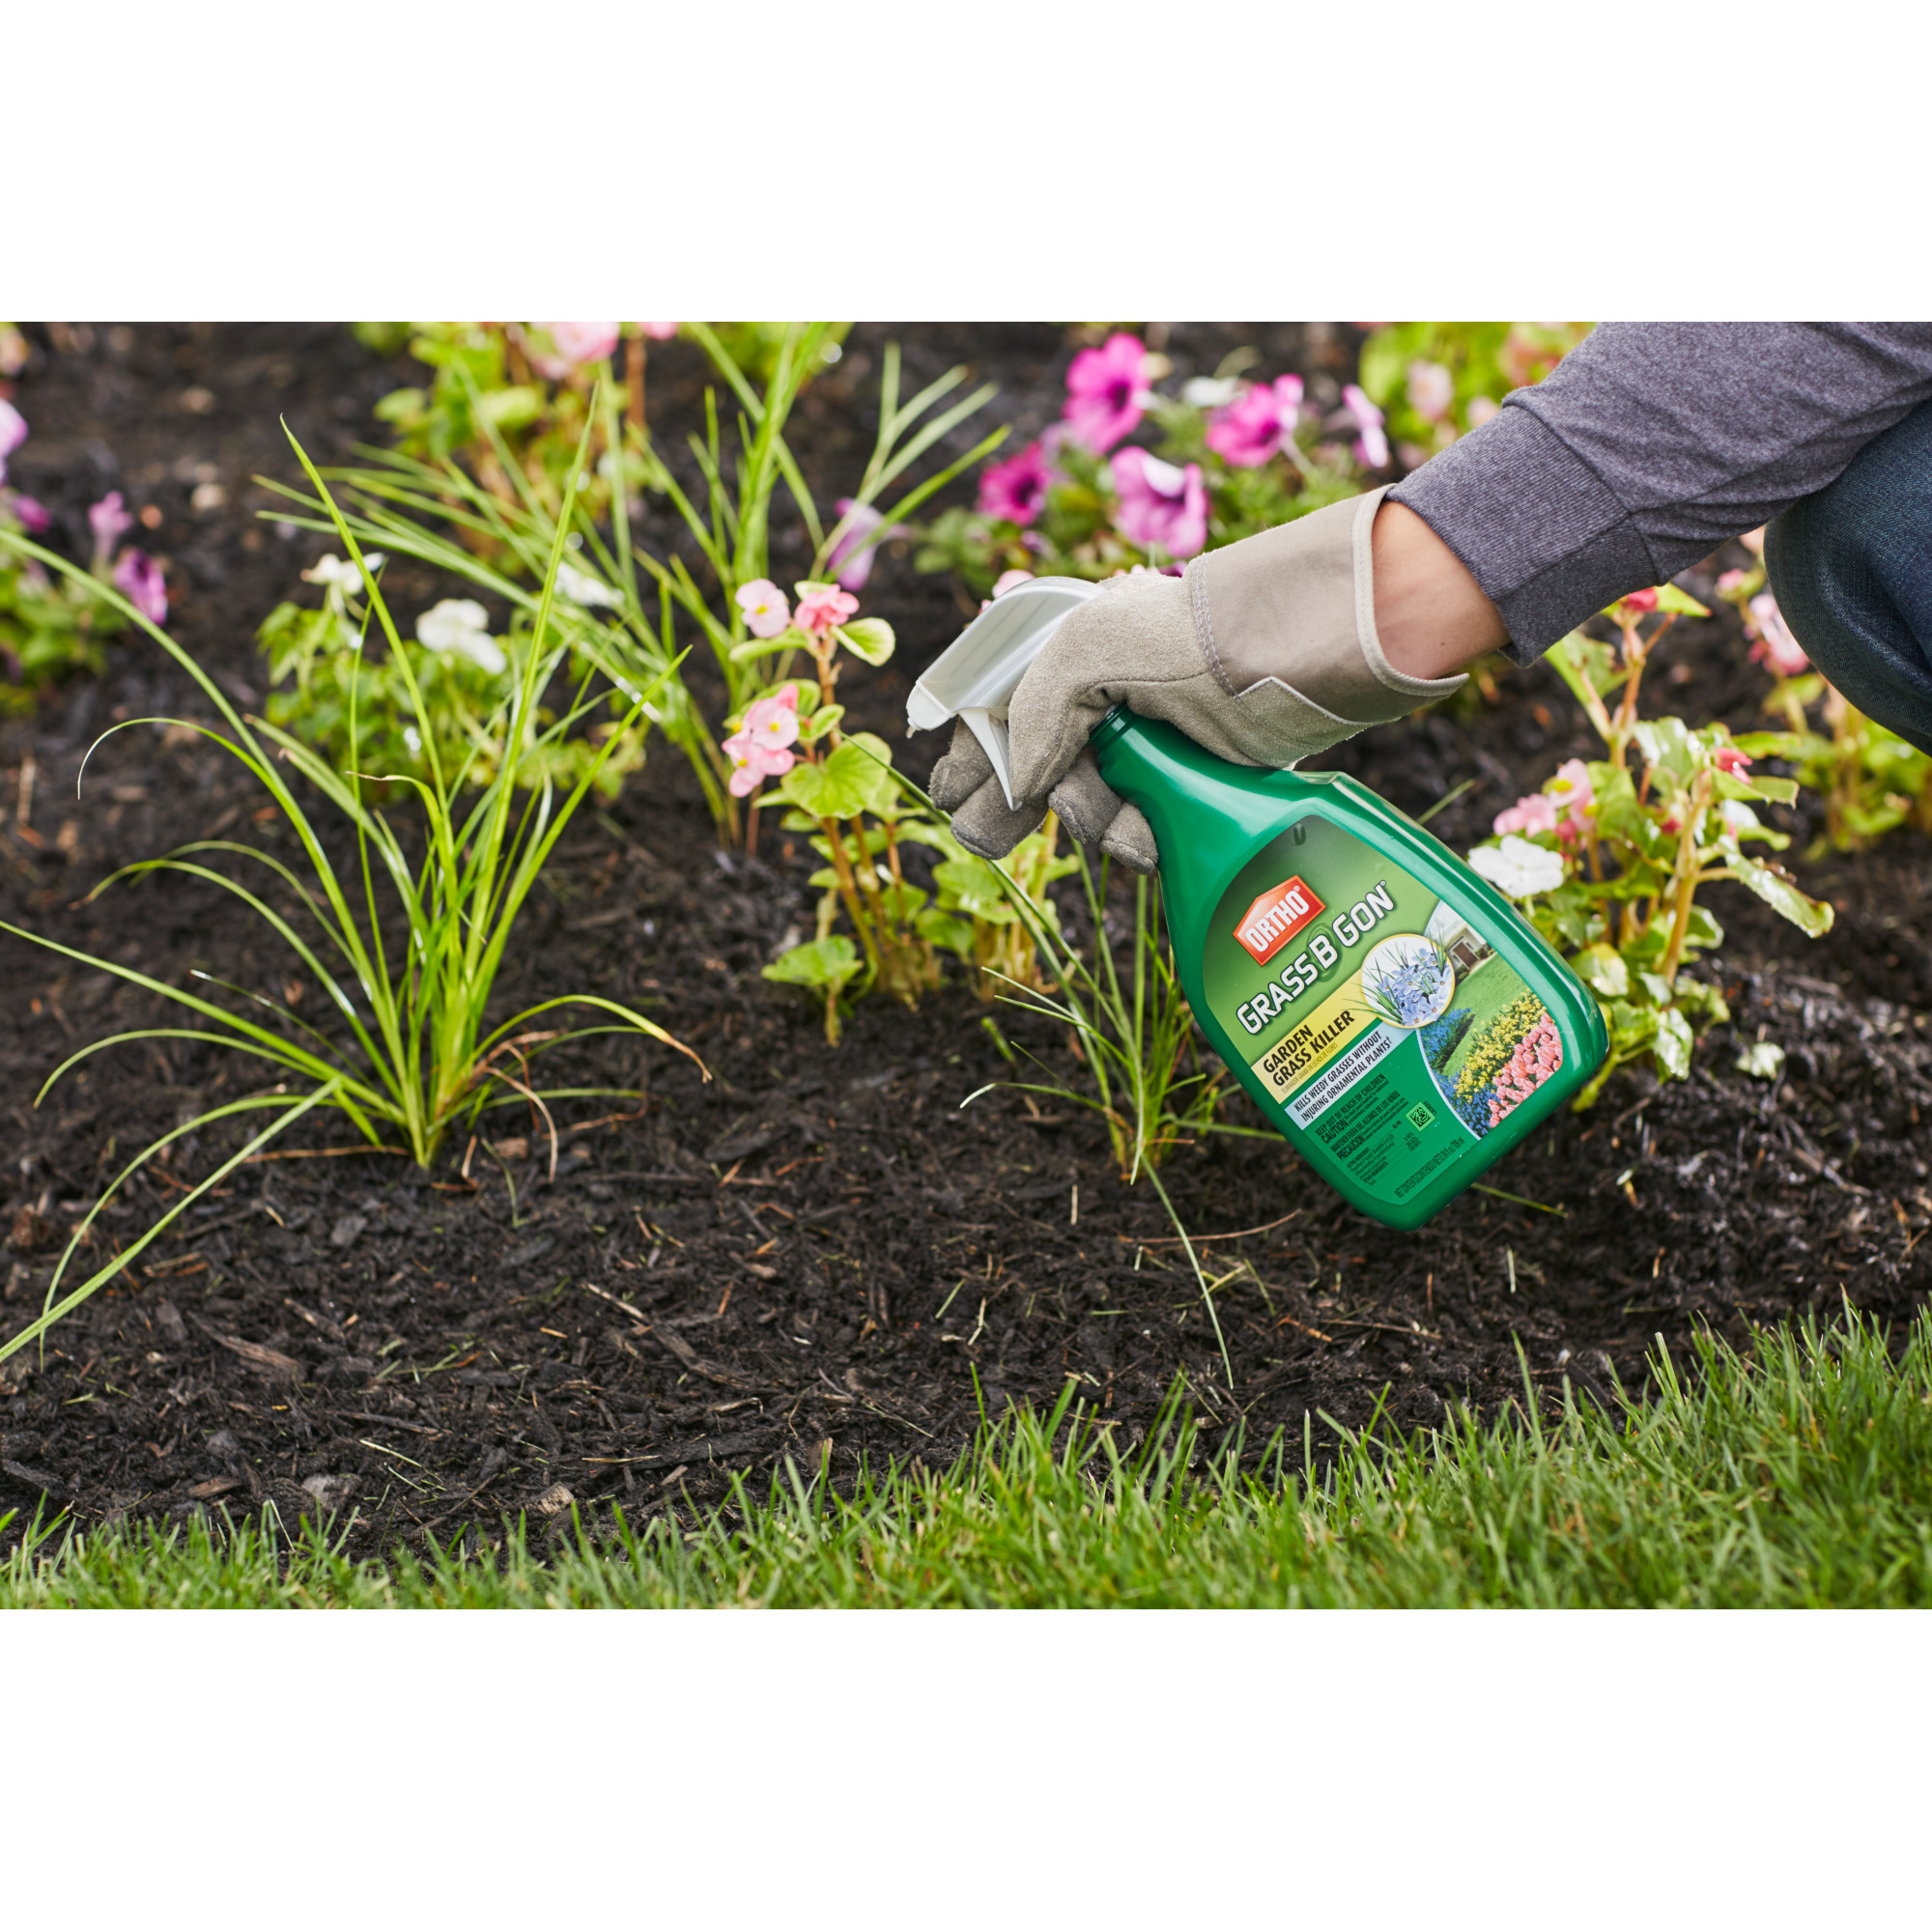 killer vegetable benefits the info weedswhat gardens in use herbicide to for vinegar htm how of garden grass